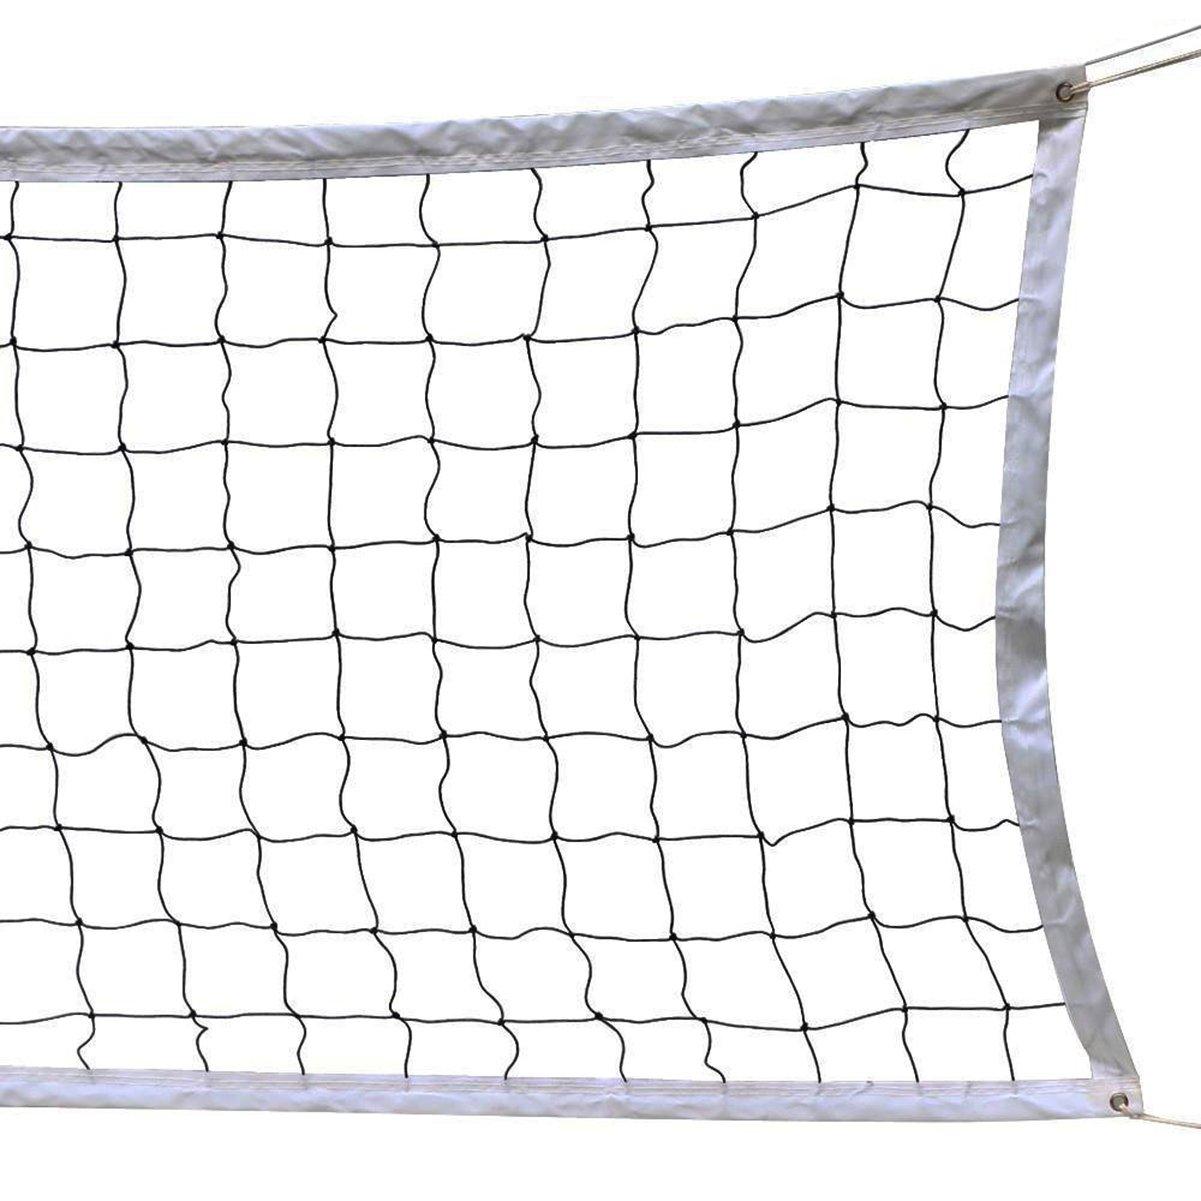 Red de Voleibol, 9.5M * 1M Con un Cable de Acero Cubierta Equipo de Deportes Al Aire Libre Plegable de La Norma Oficial J & L JM00052-01@#JL